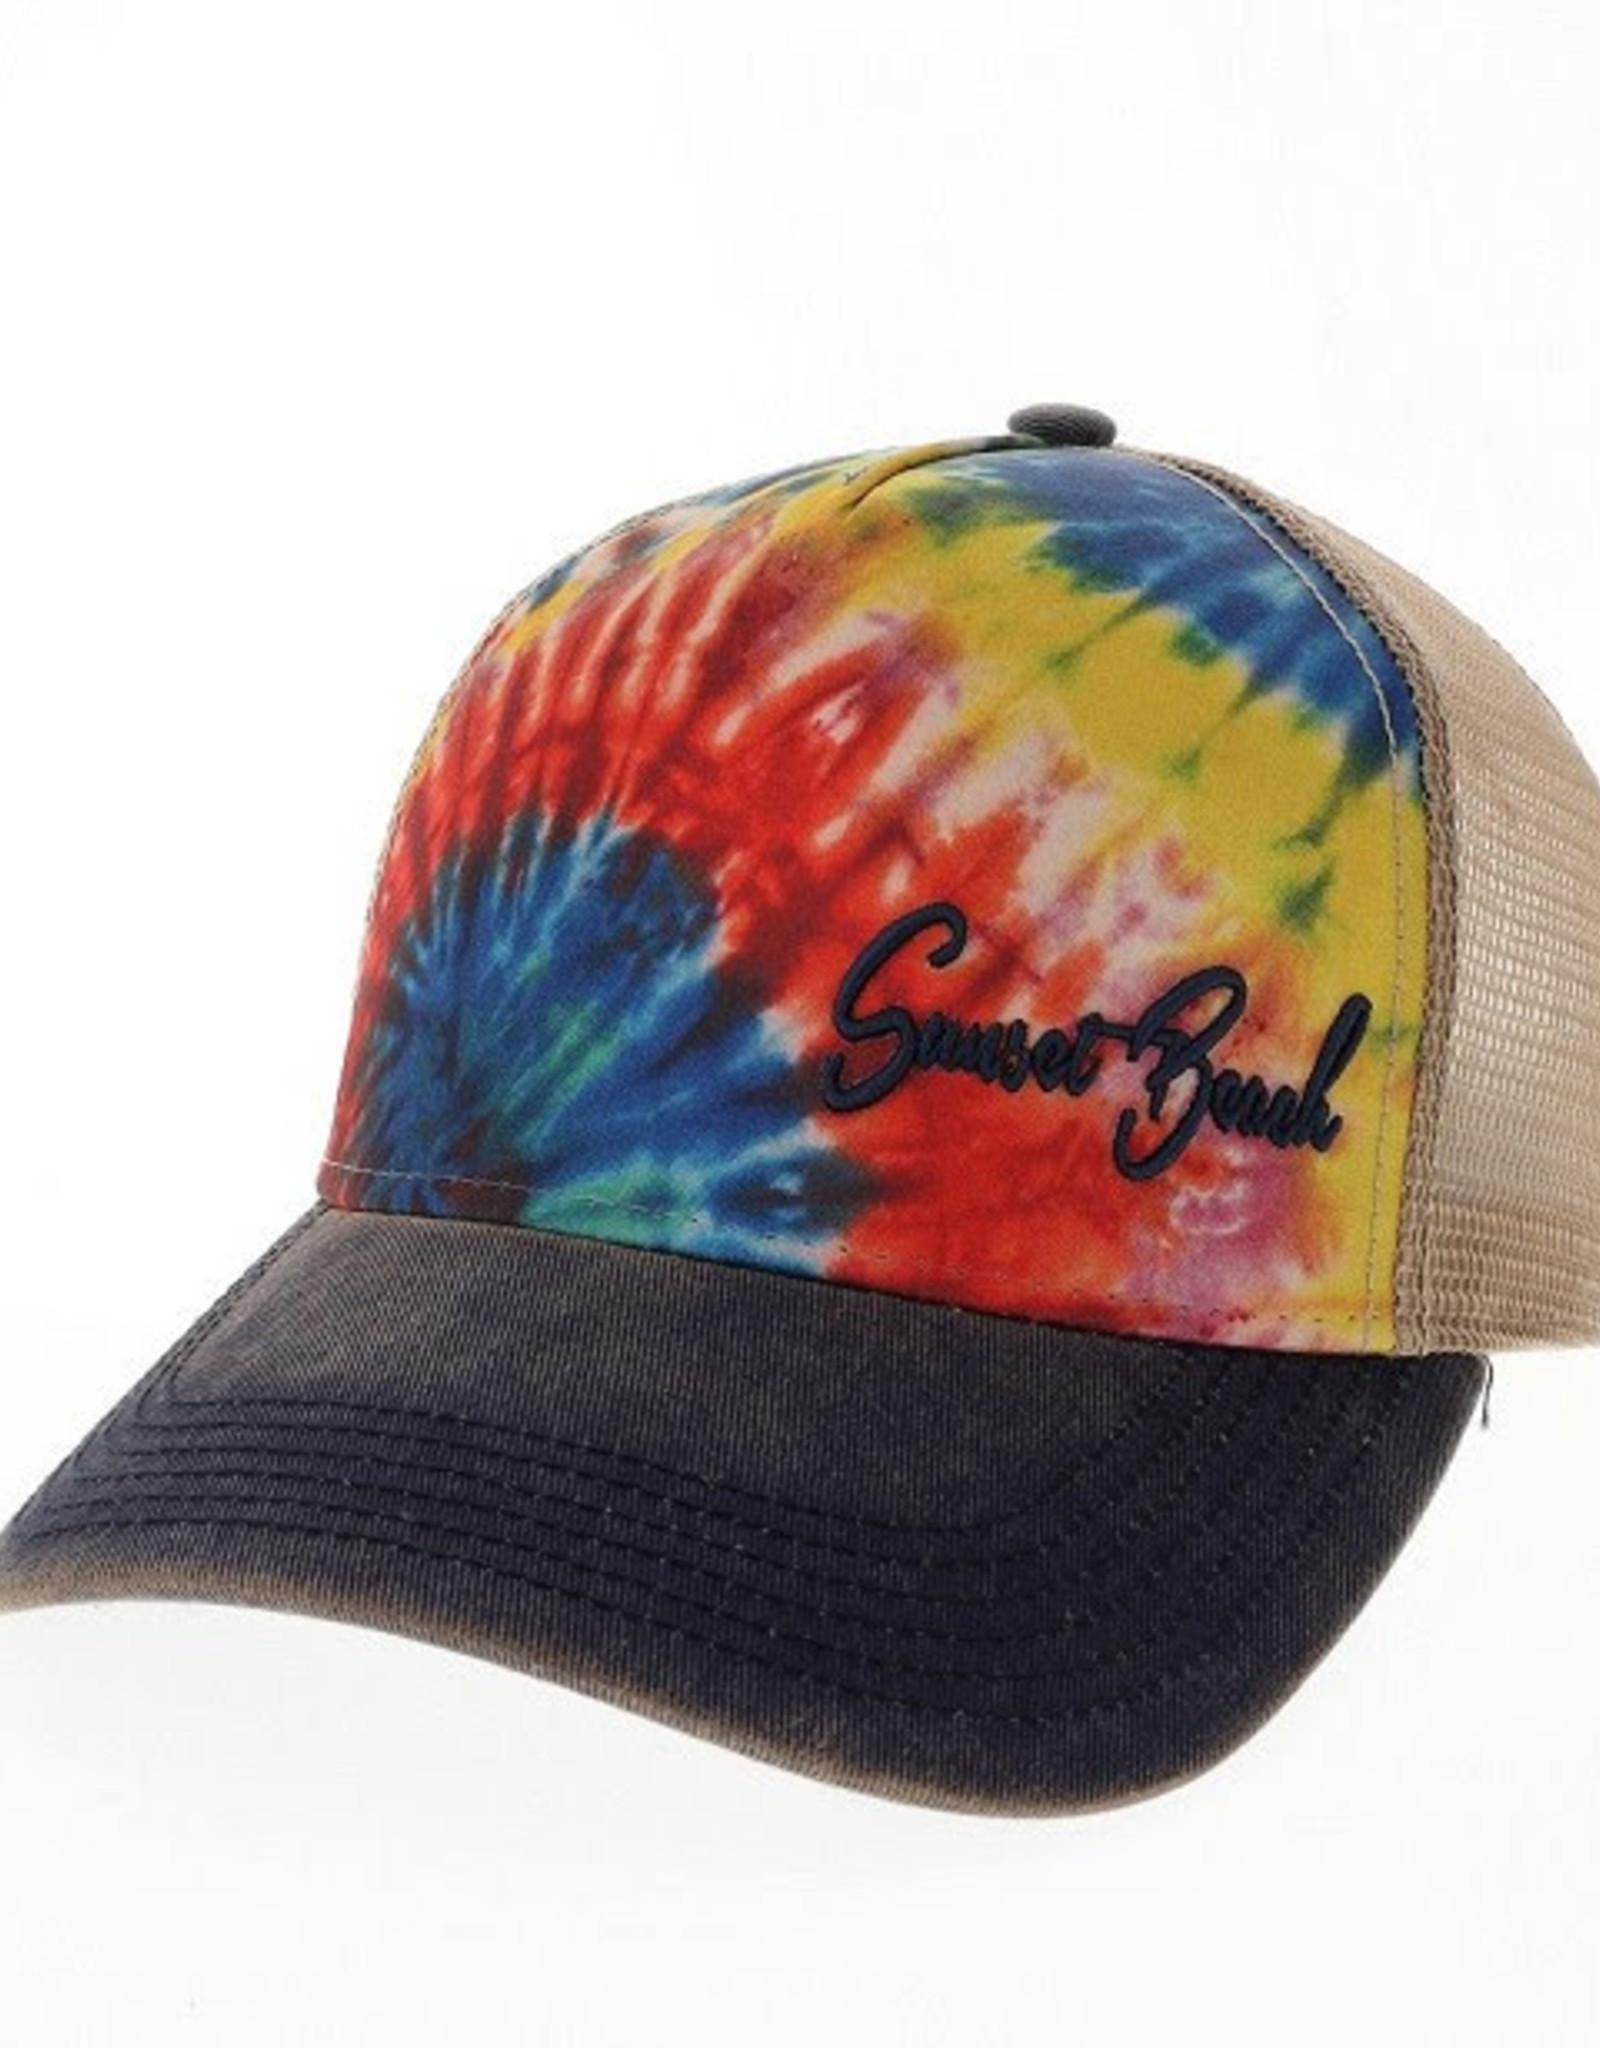 TIE DYE OFAS TRUCKER CAP RAINBOW